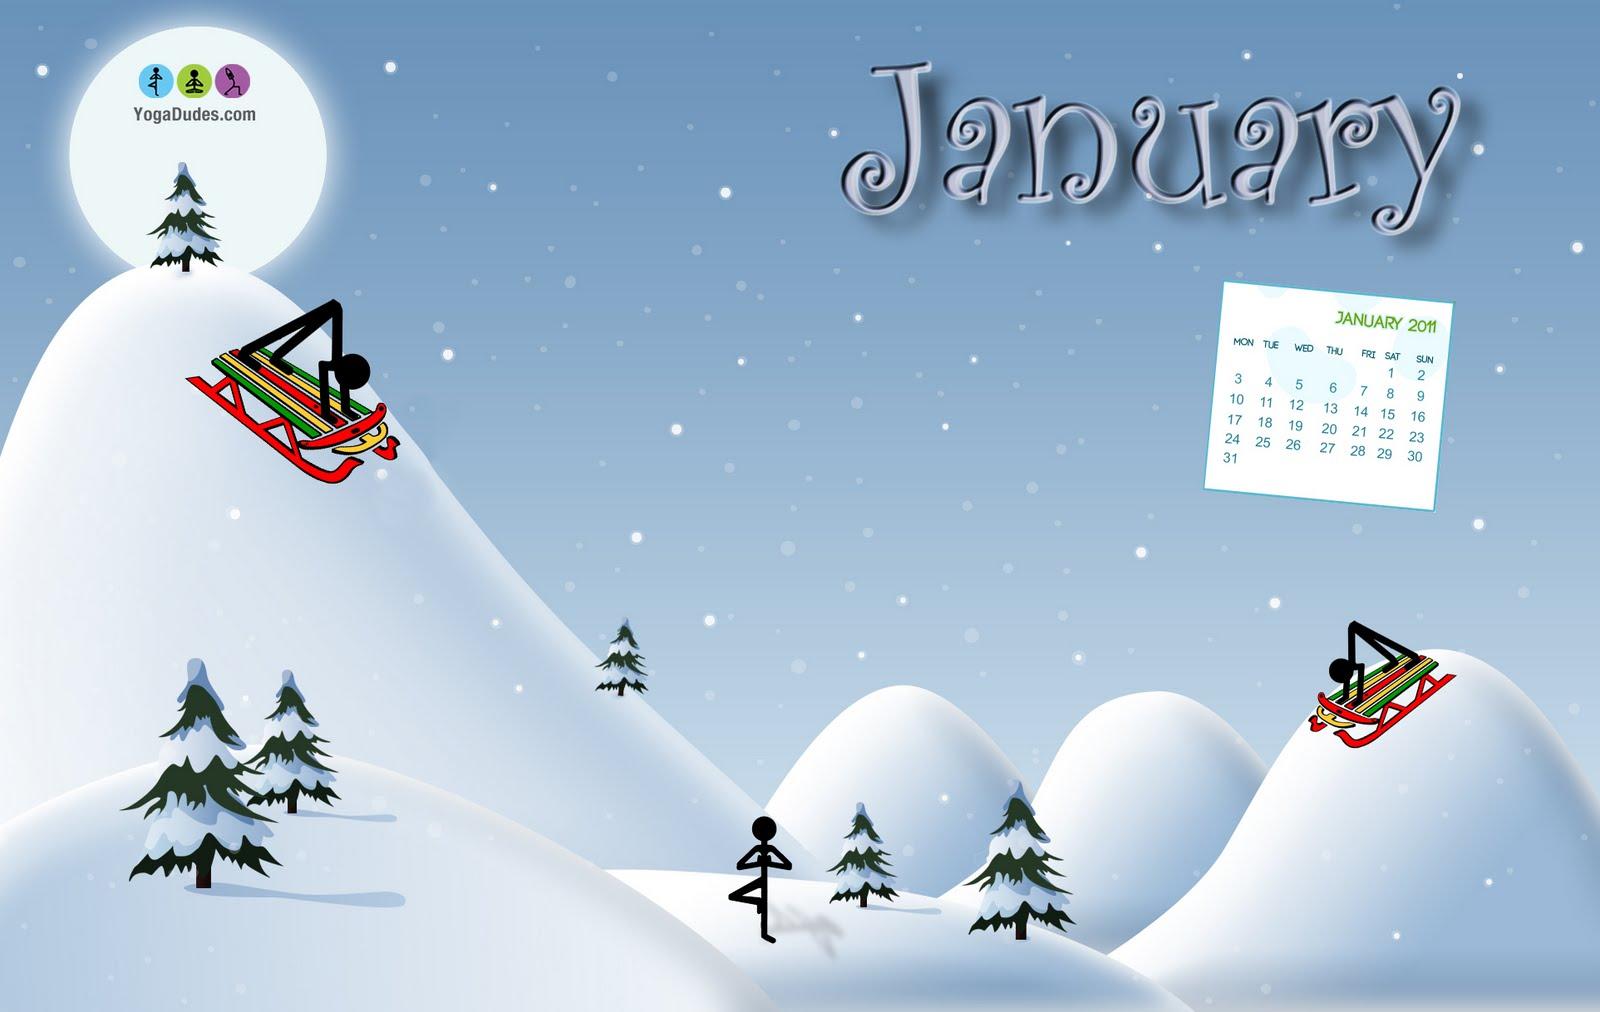 January 2016 Computer Desktop Calendar Search Results Calendar 2016 1600x1012